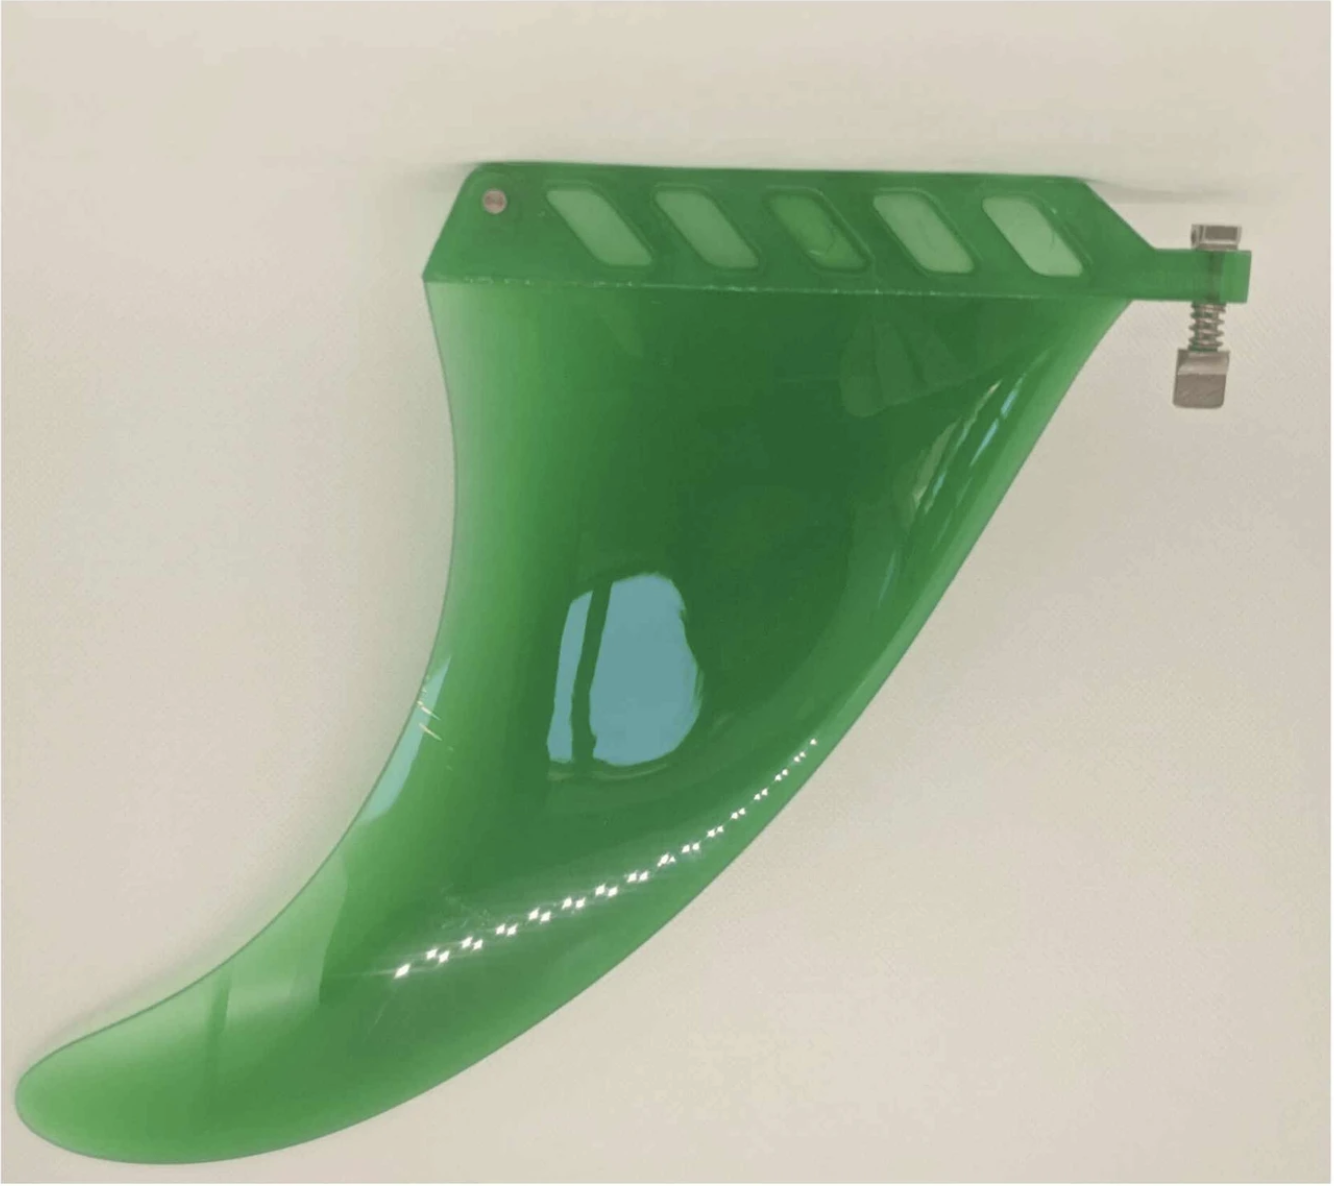 SOL 8 inch Unbreakable Center Flex Fin